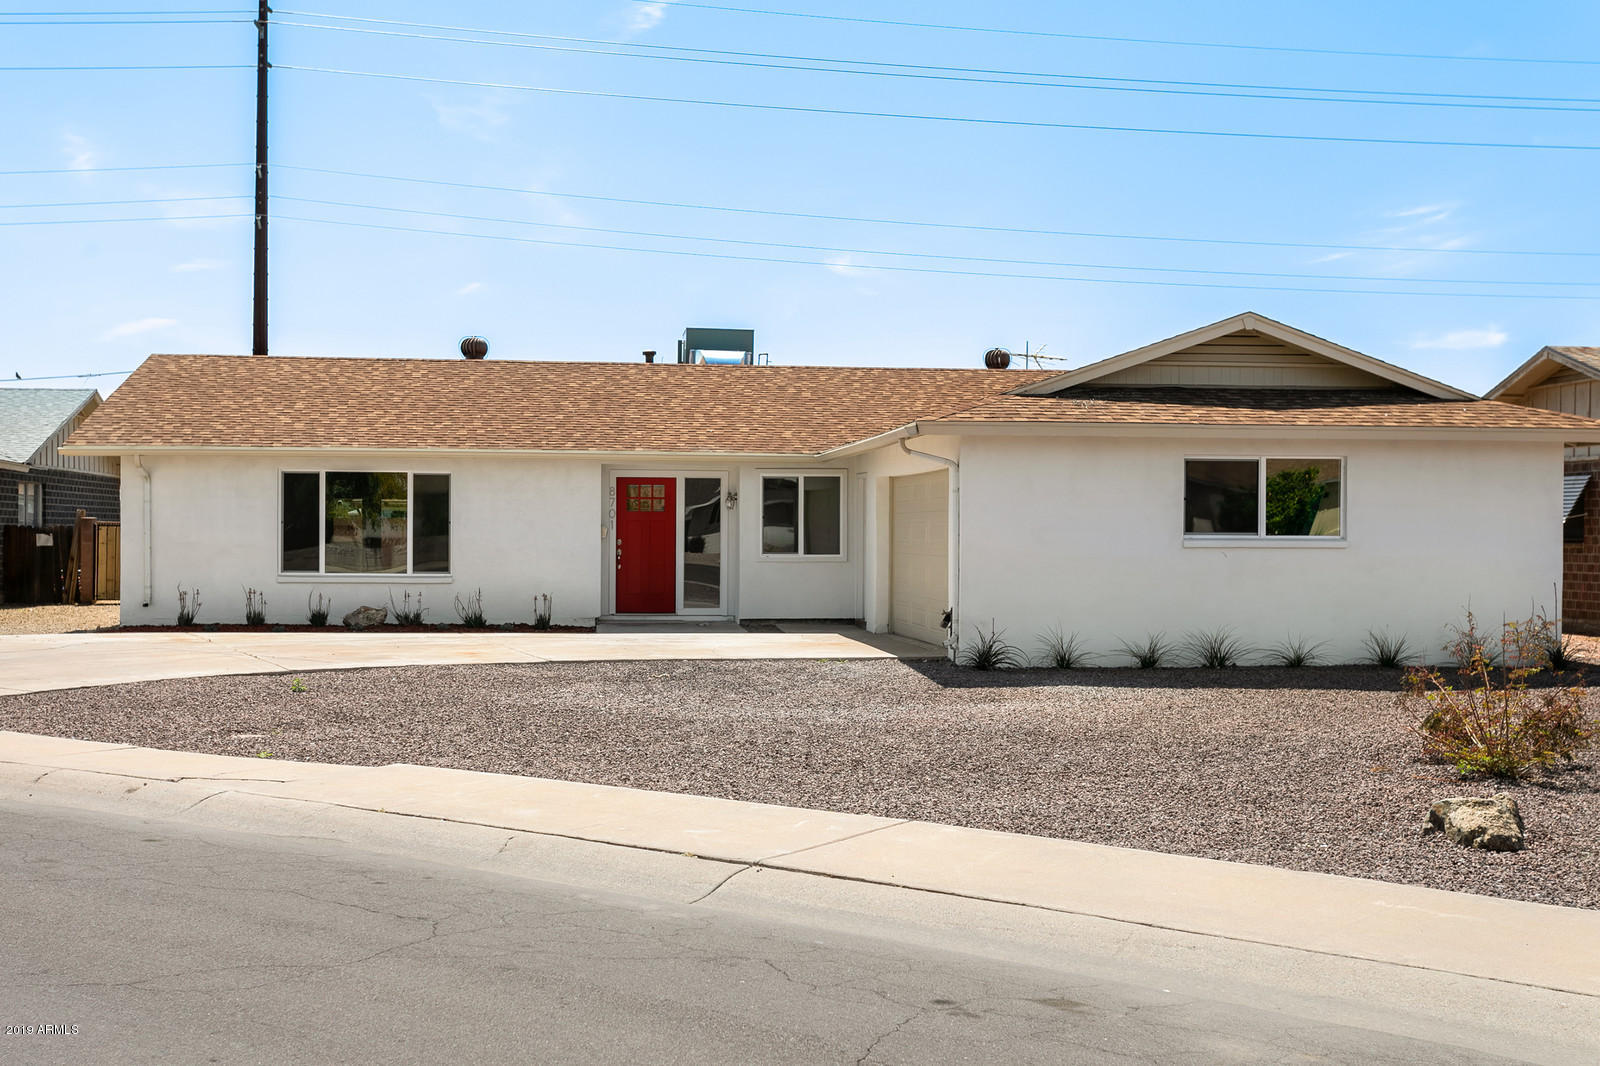 8701 E CRESTWOOD Way, Scottsdale, Arizona